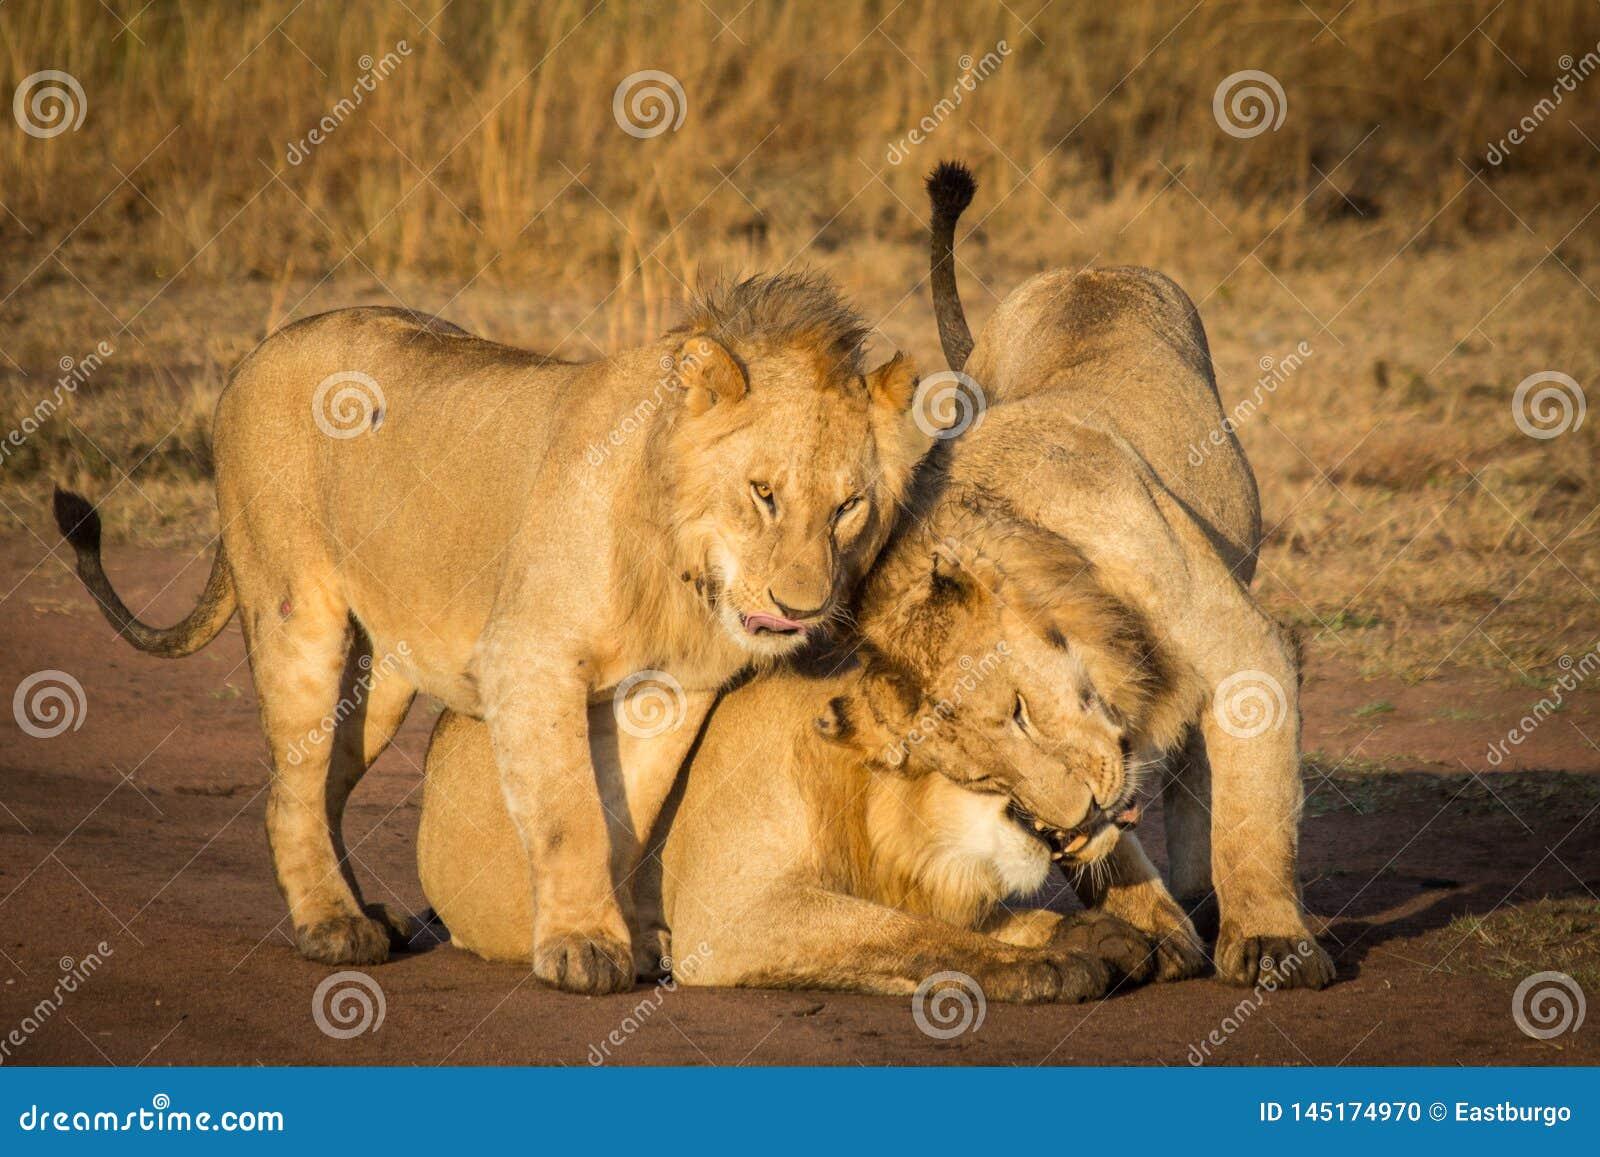 Three Lions Cuddle